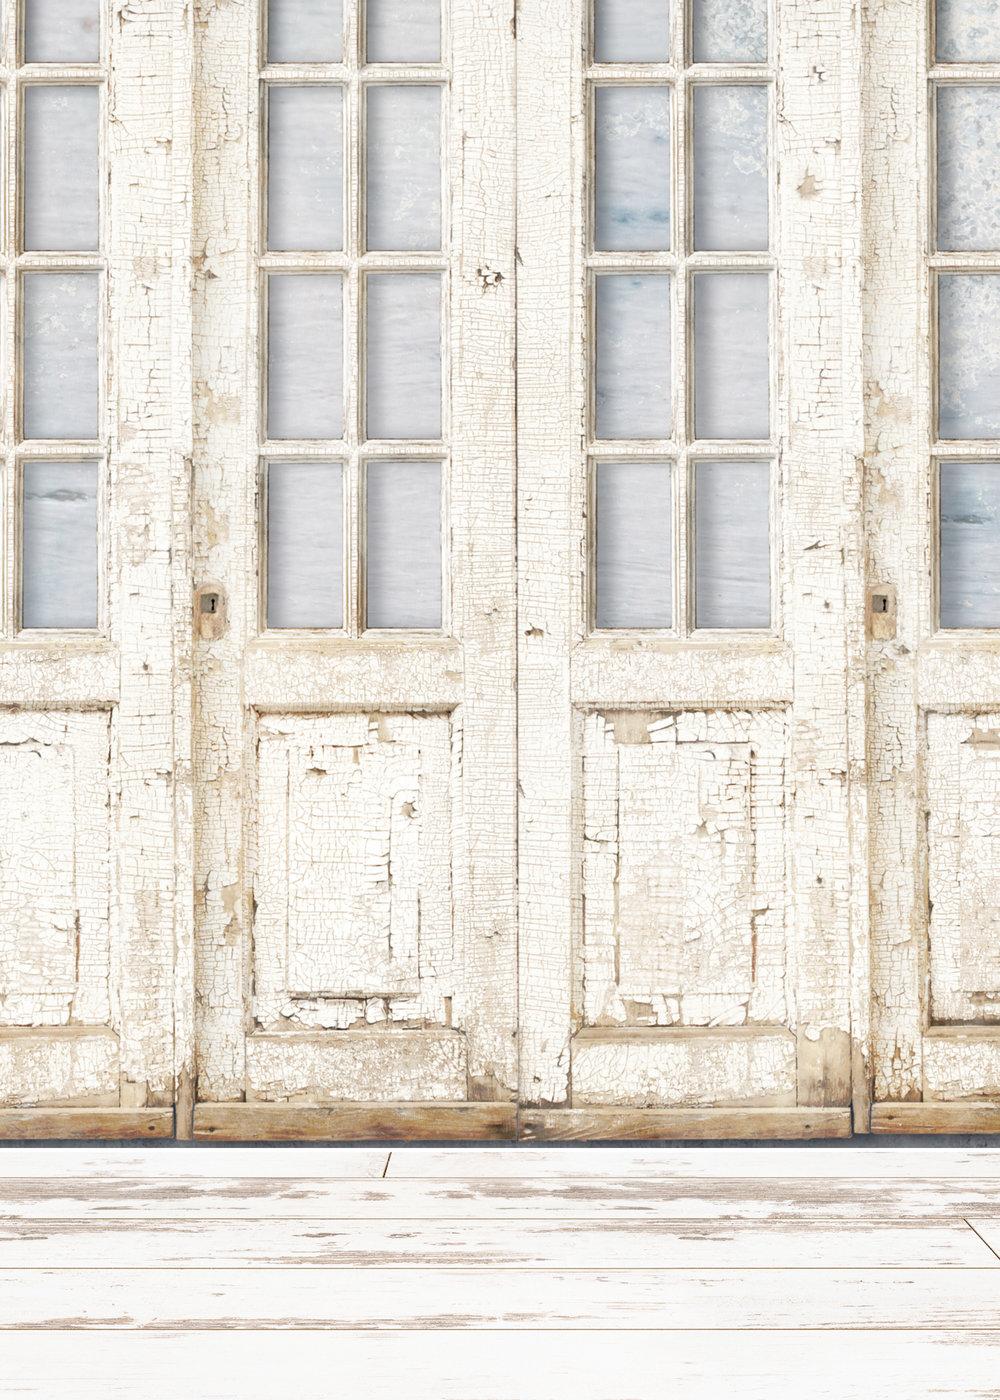 Background F - Antique Doors